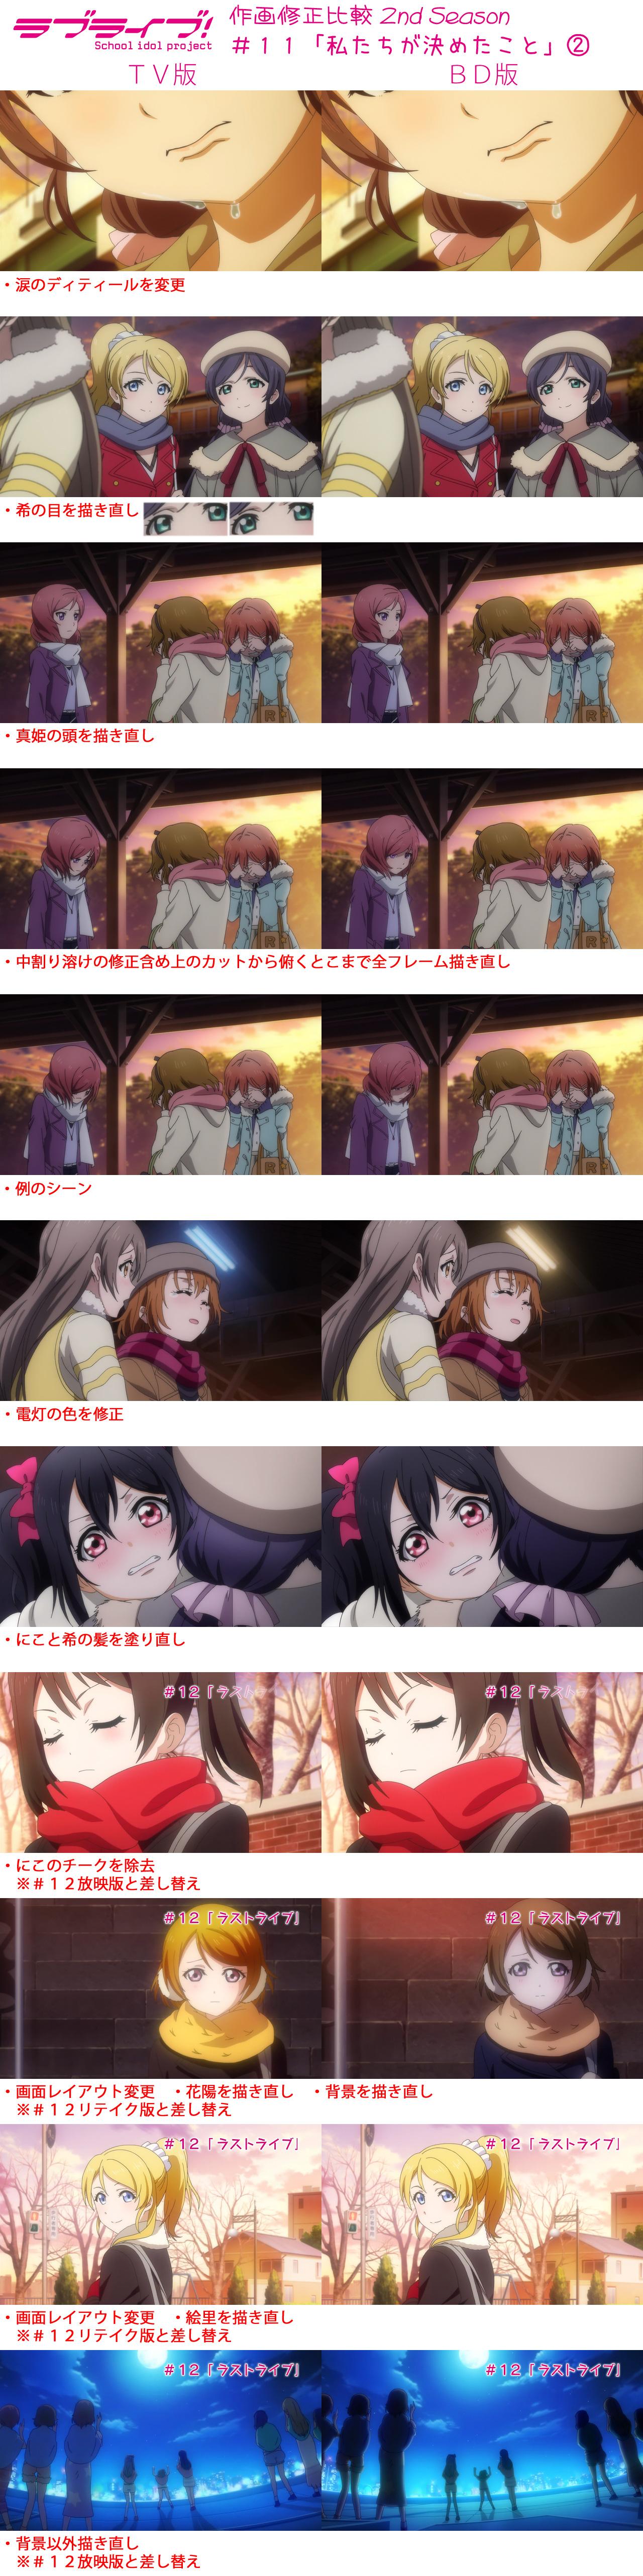 Love-Live!-School-Idol-Project_Haruhichan.com-Season-2-TV-Blu-Ray-Comparison-Episode-11-Part-2